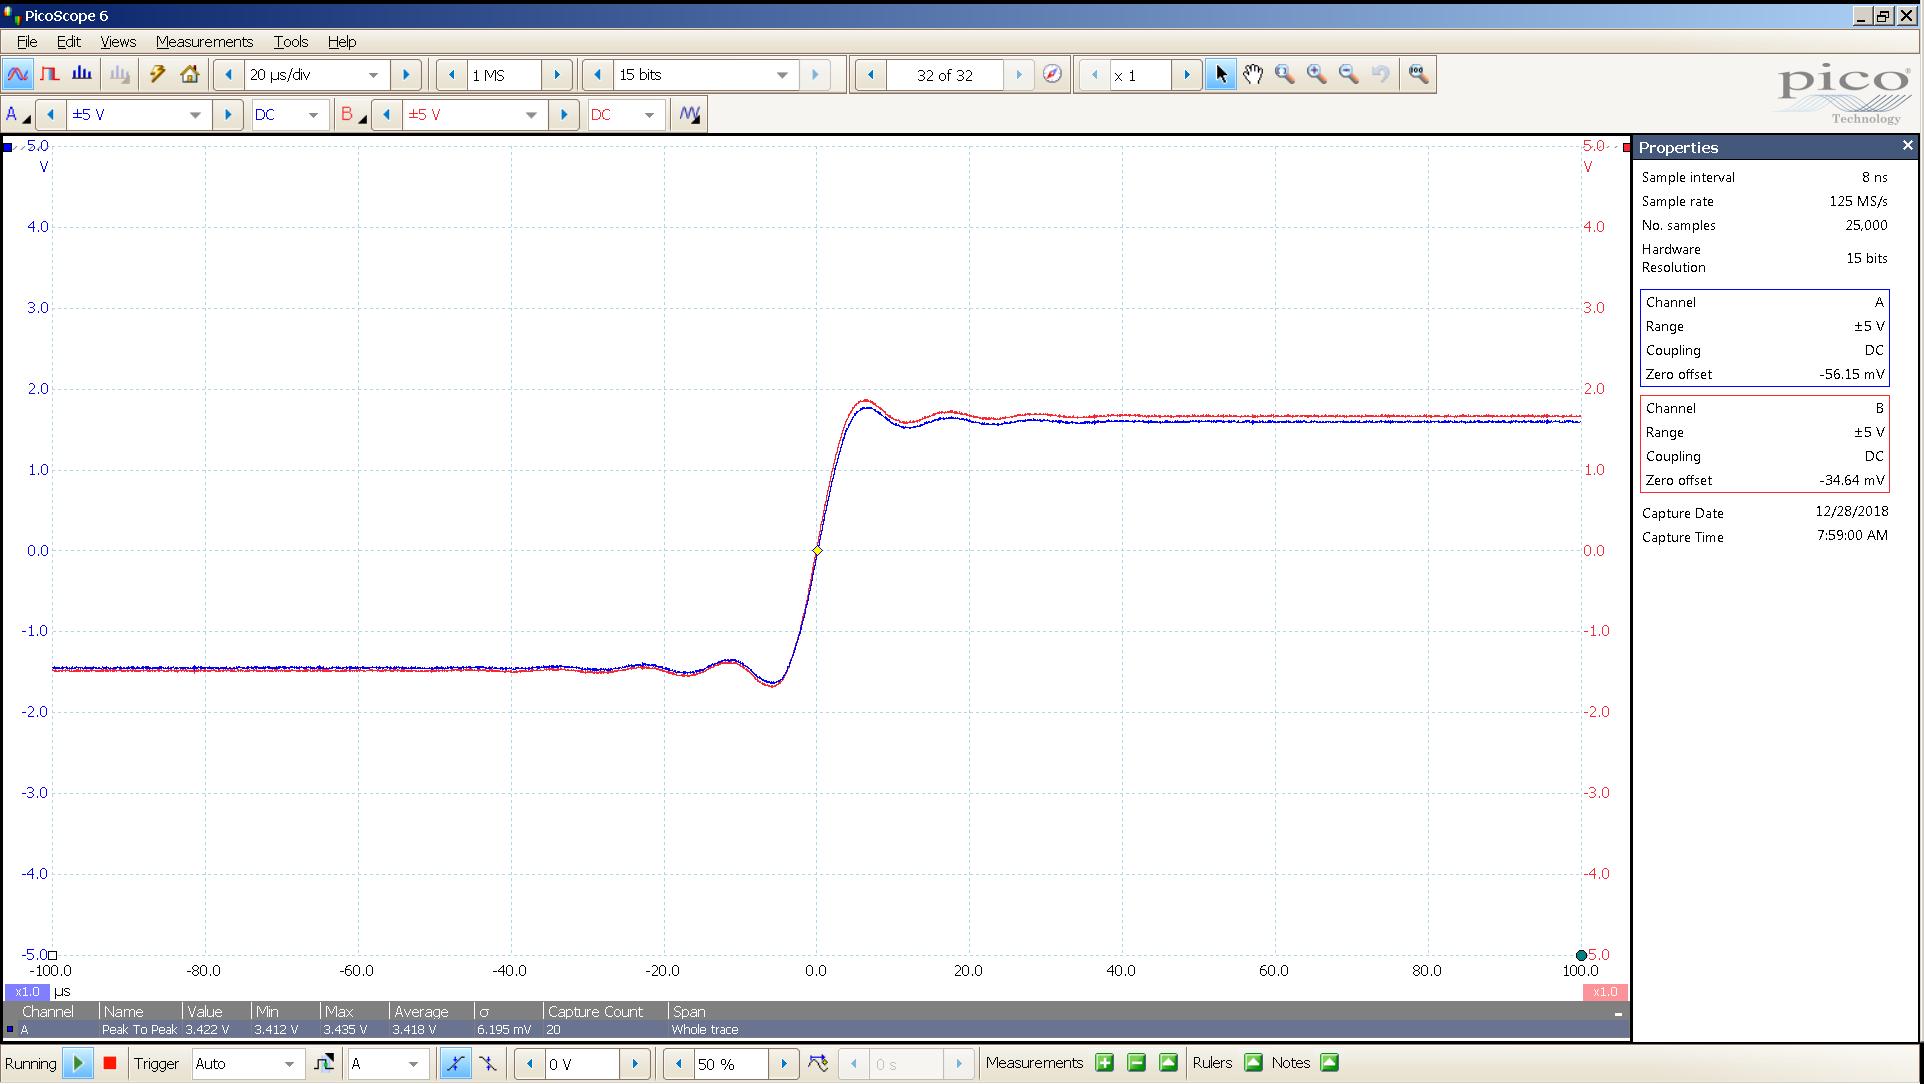 20181227-26 convert2 Bal 20 Hz sqr 0 dBFS 4 Vpp 20uS div - AES 176K.PNG